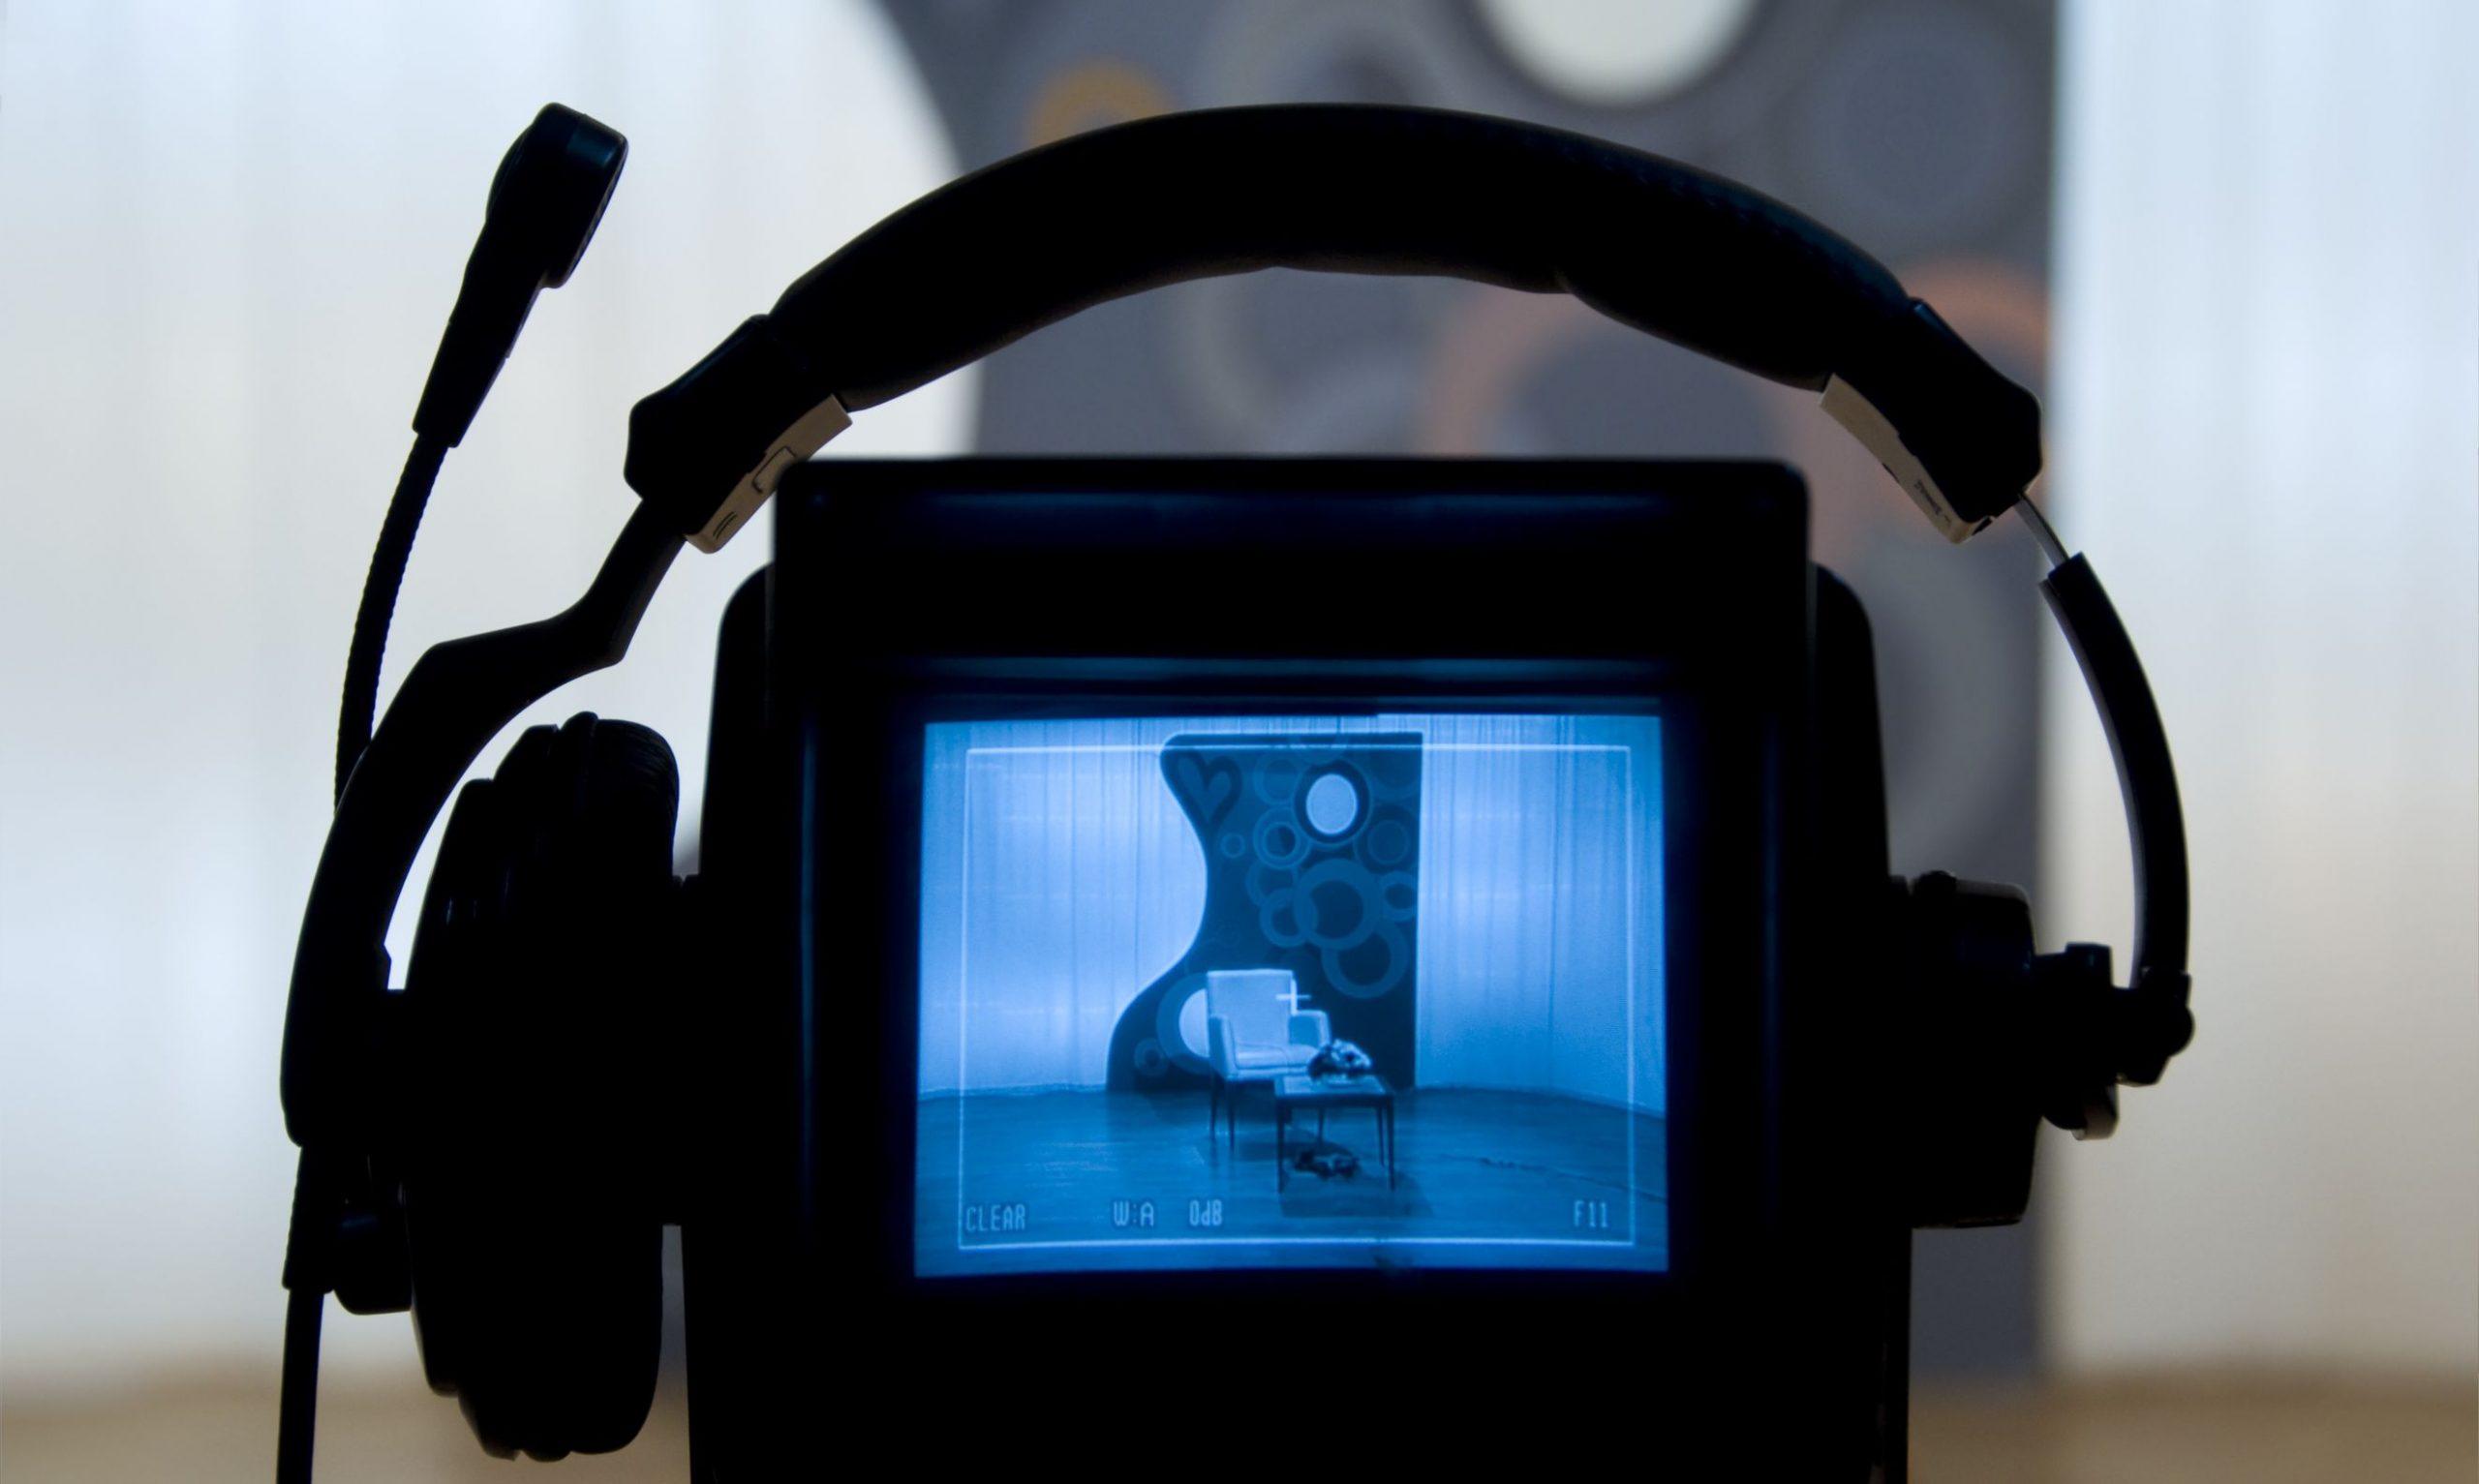 Capturadora de vídeo USB: ¿Cuál es la mejor del 2021?